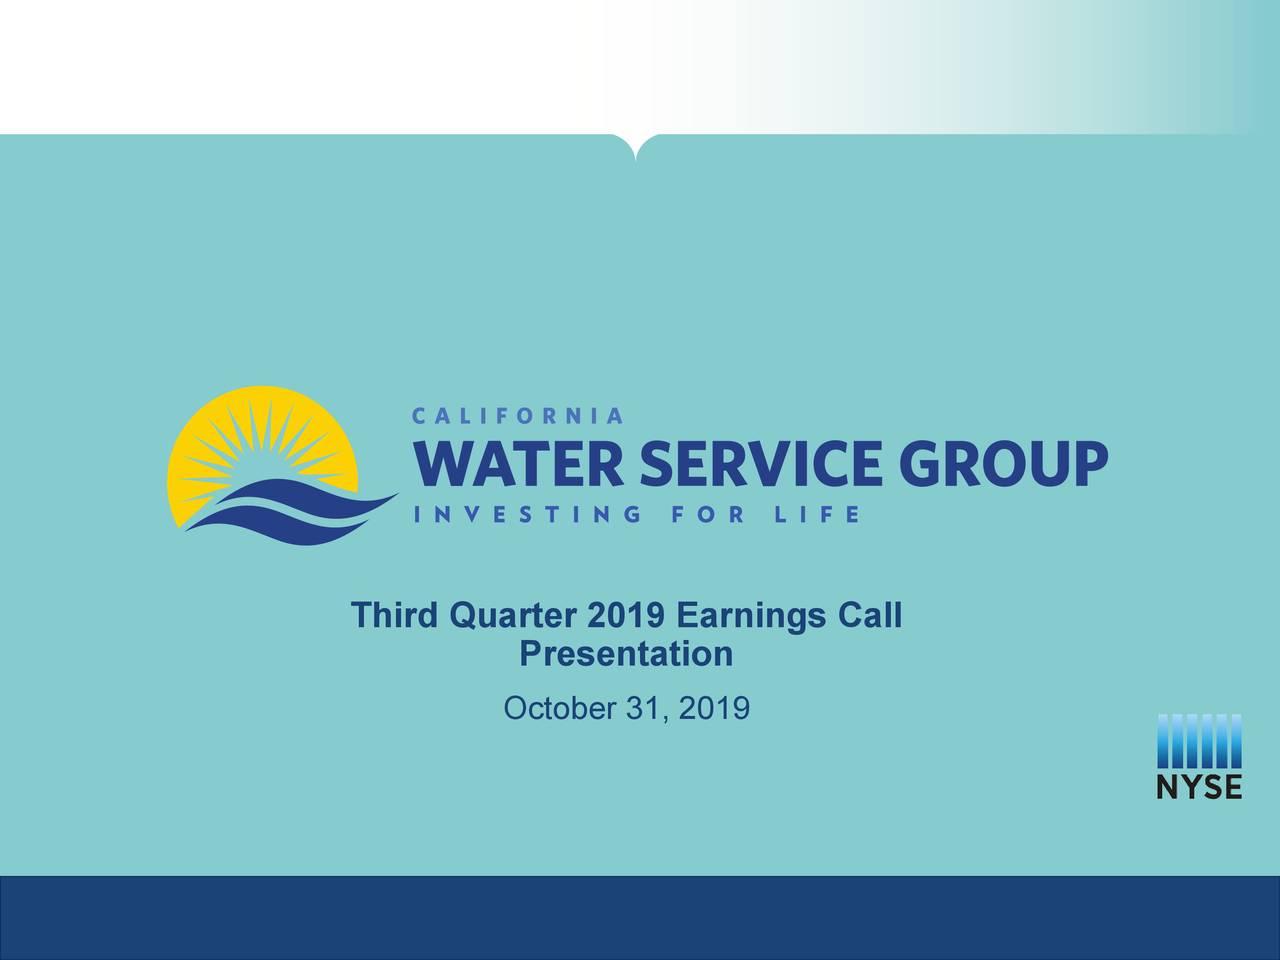 Third Quarter 2019 Earnings Call